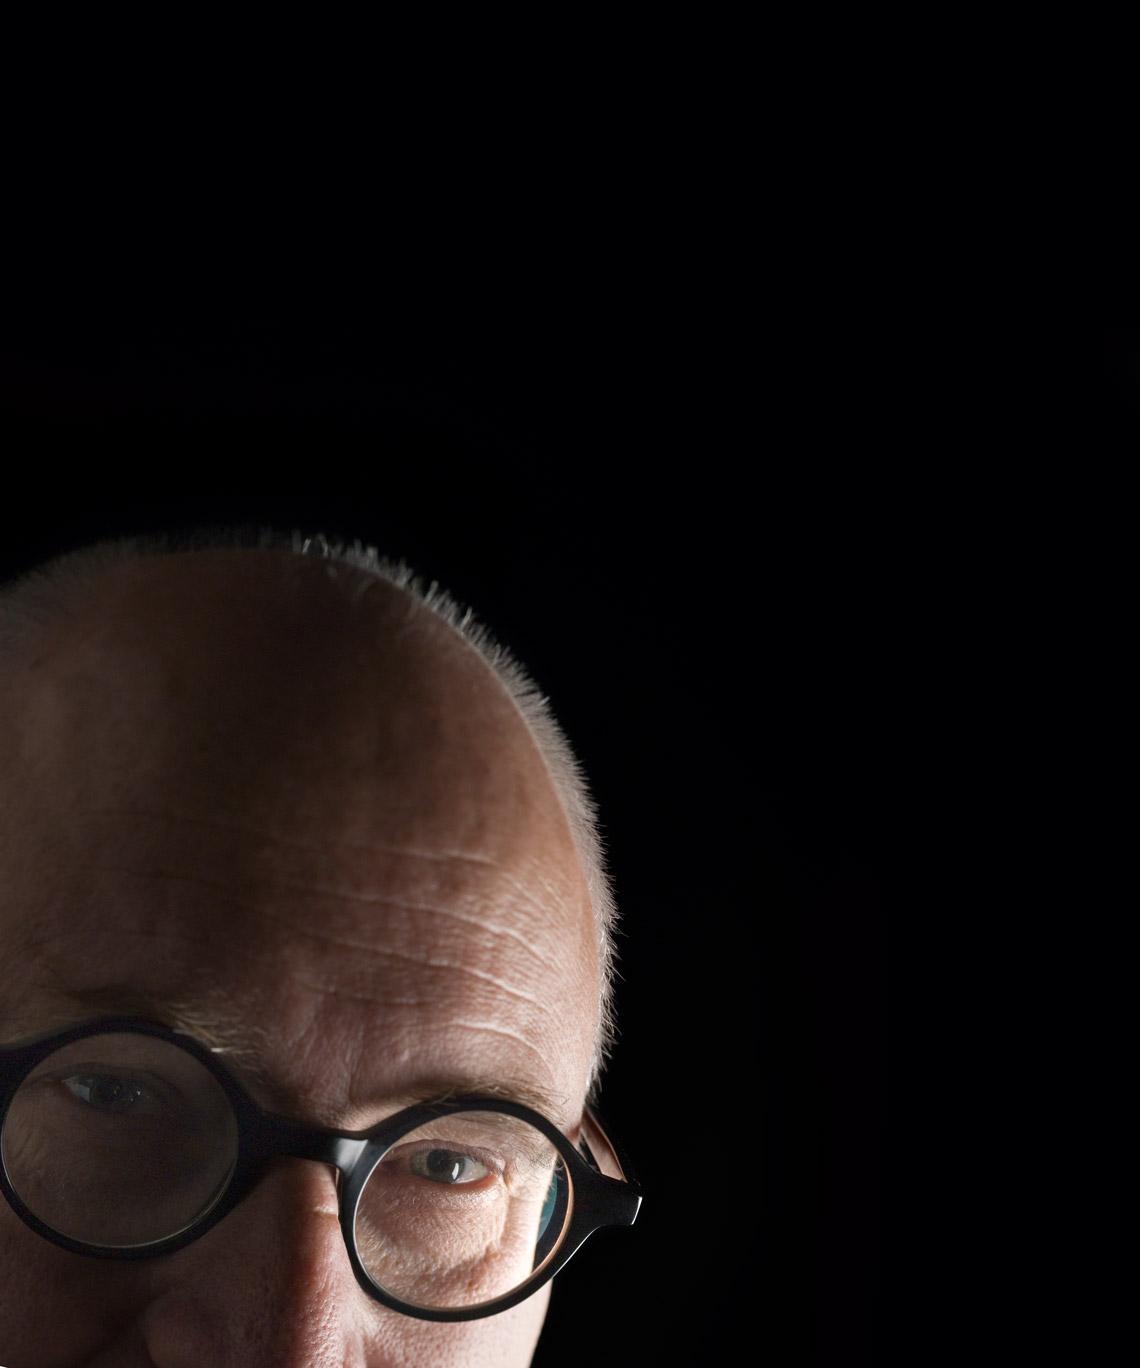 Han Sieveking | portrait photography | Mike Harris Photography